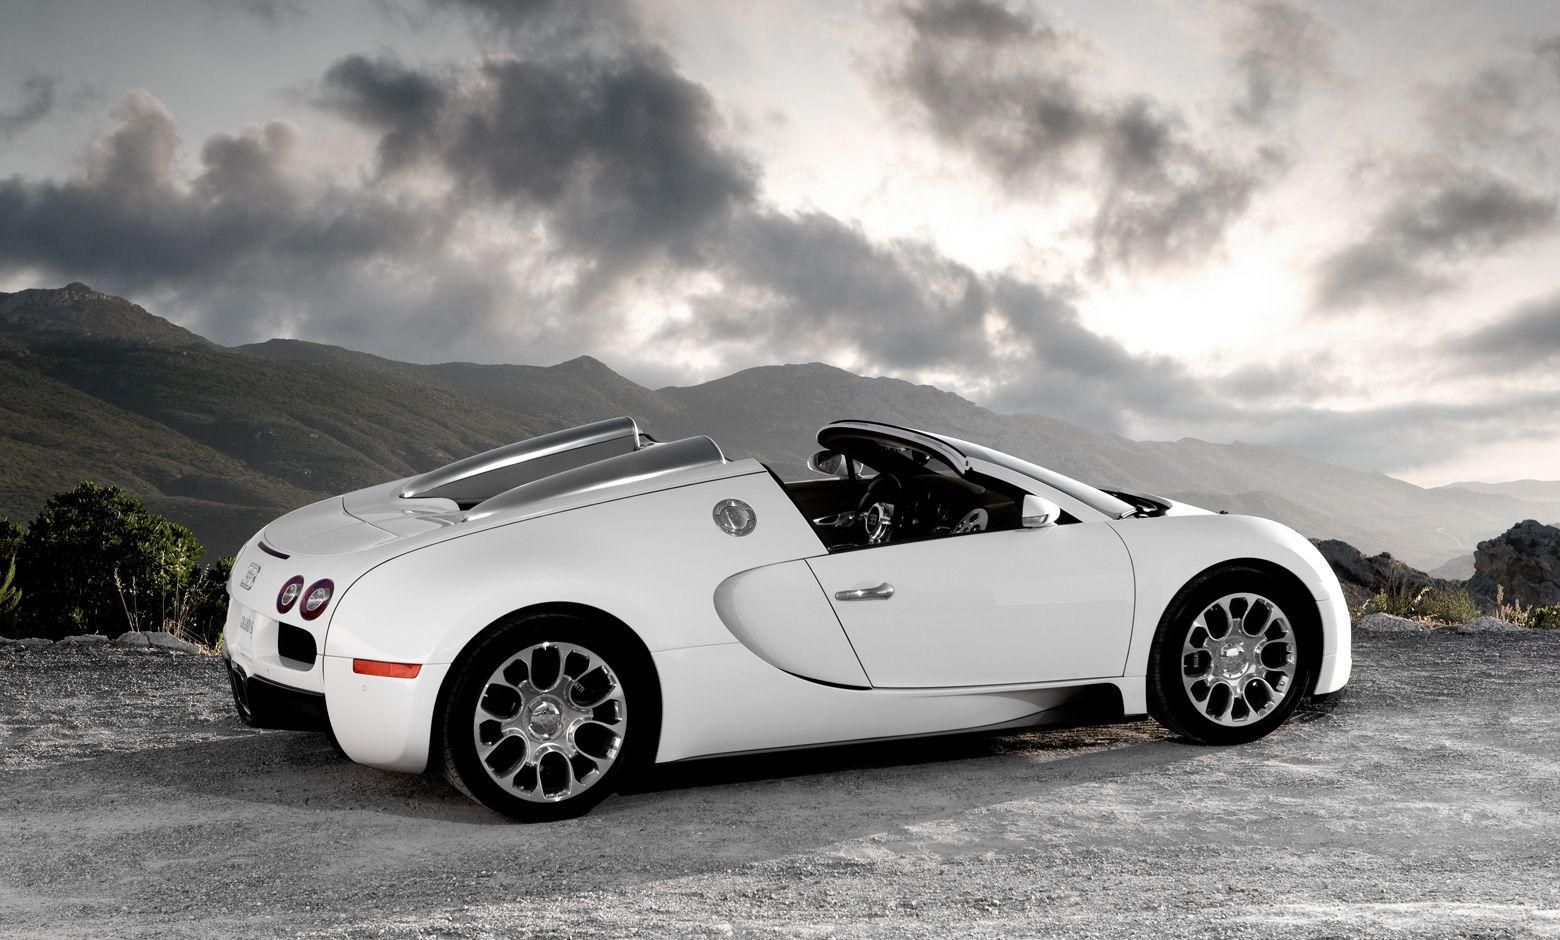 All new Bugatti Veyron in Diamond white colour are now at